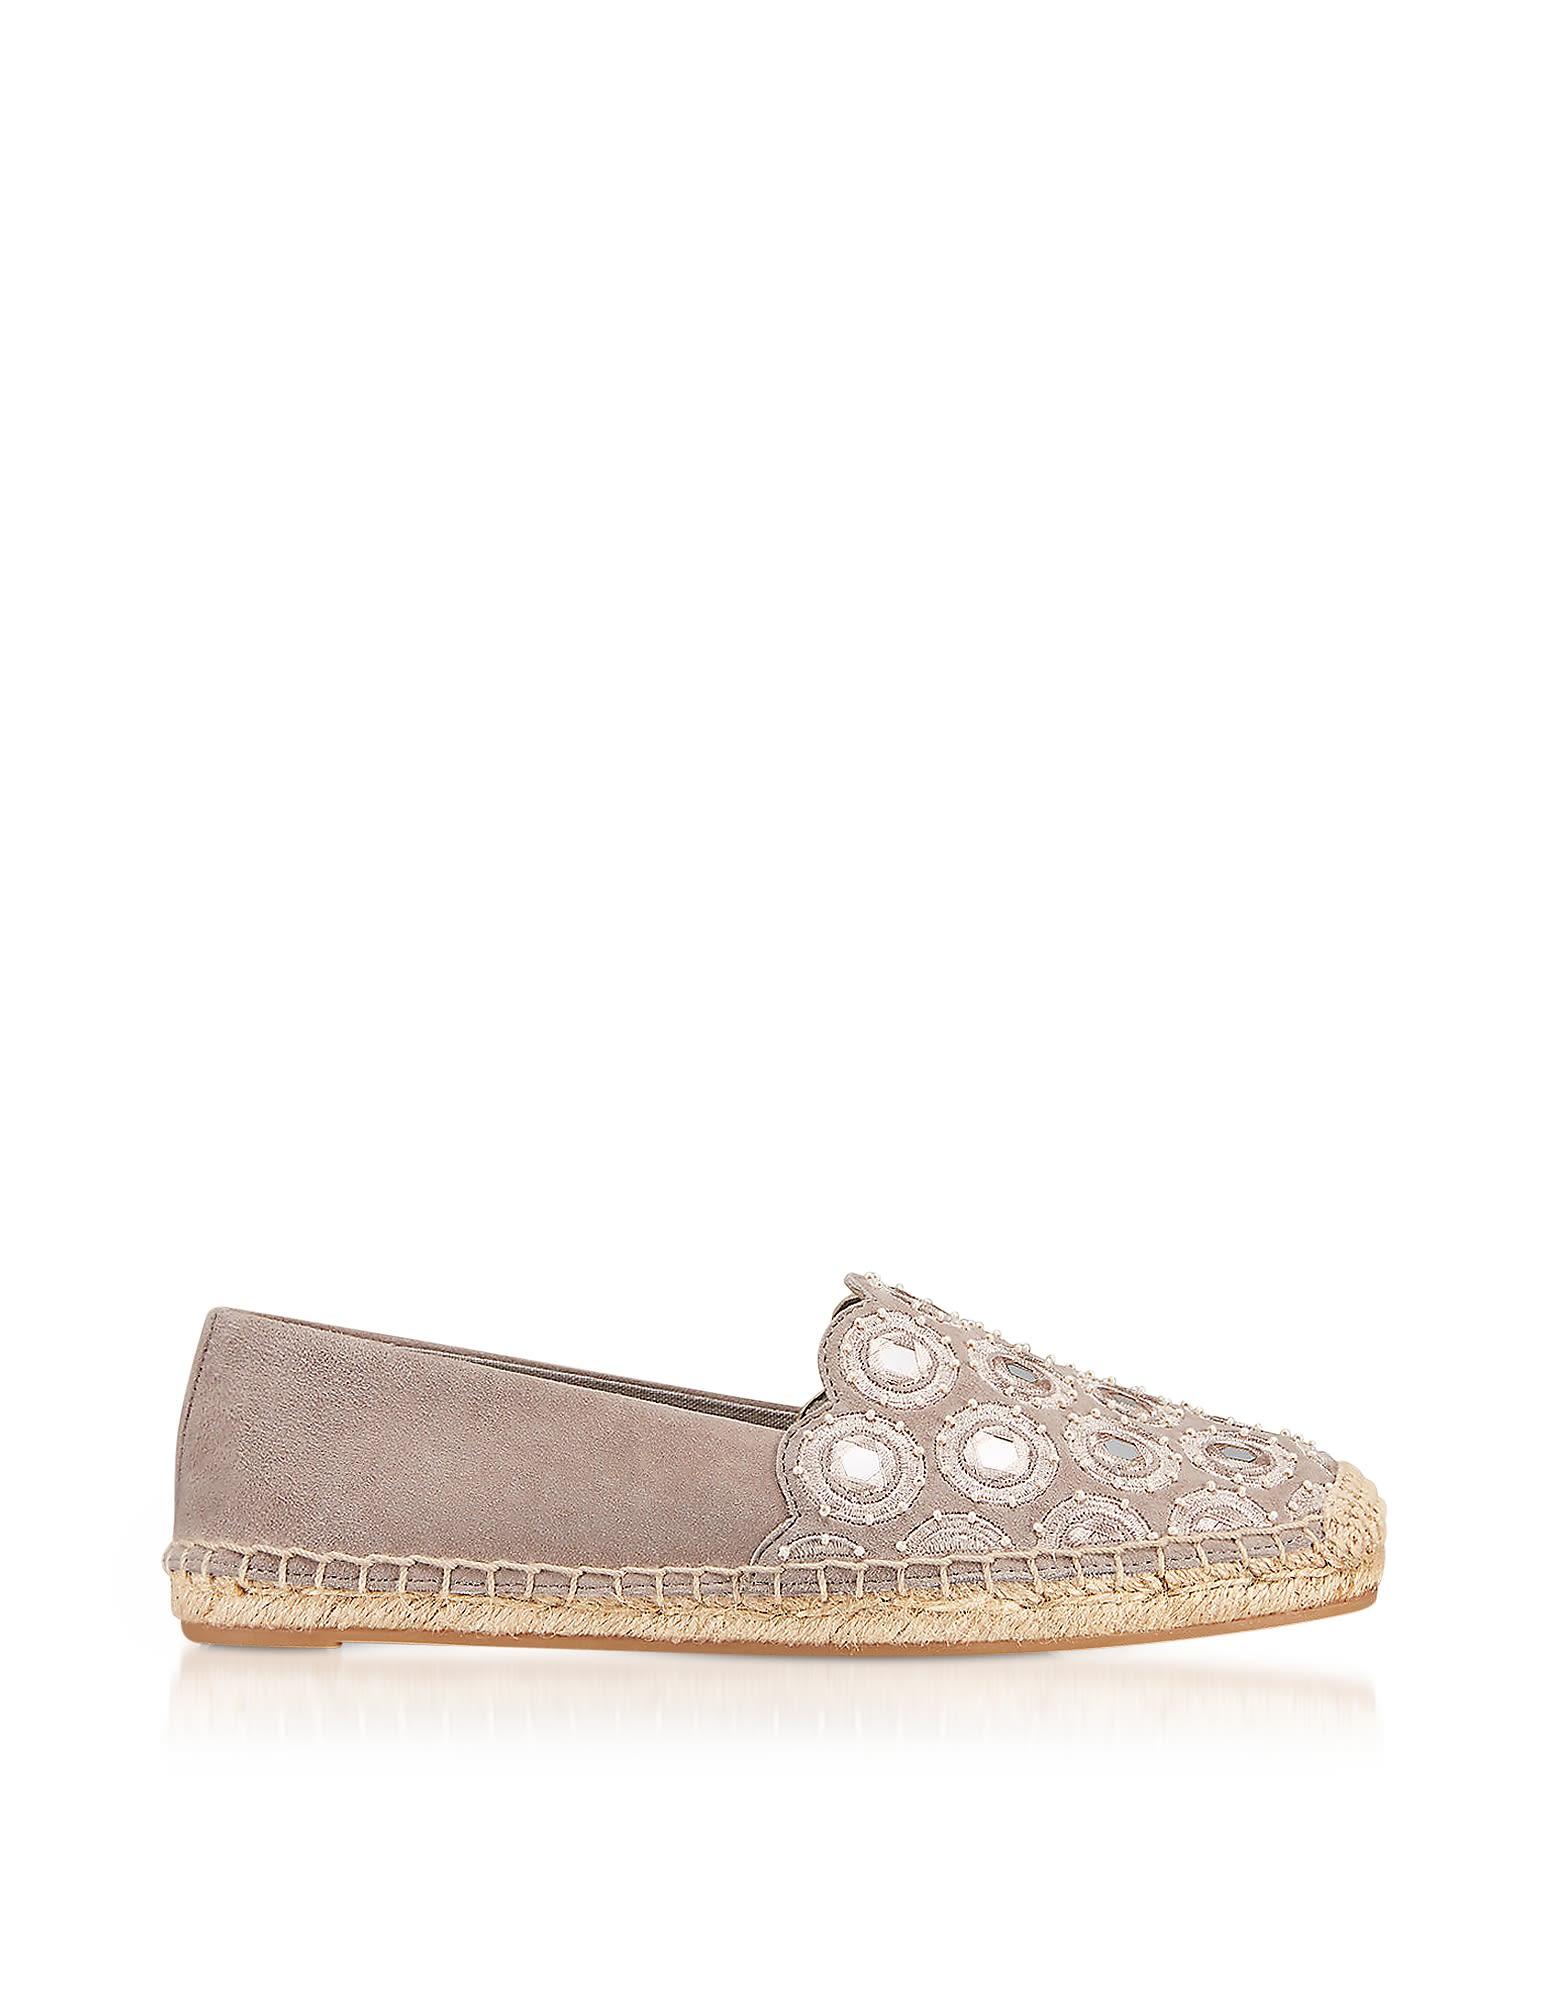 Tory Burch Designer Shoes, Yasmin Dust Storm Suede Embellished Flat Espadrilles